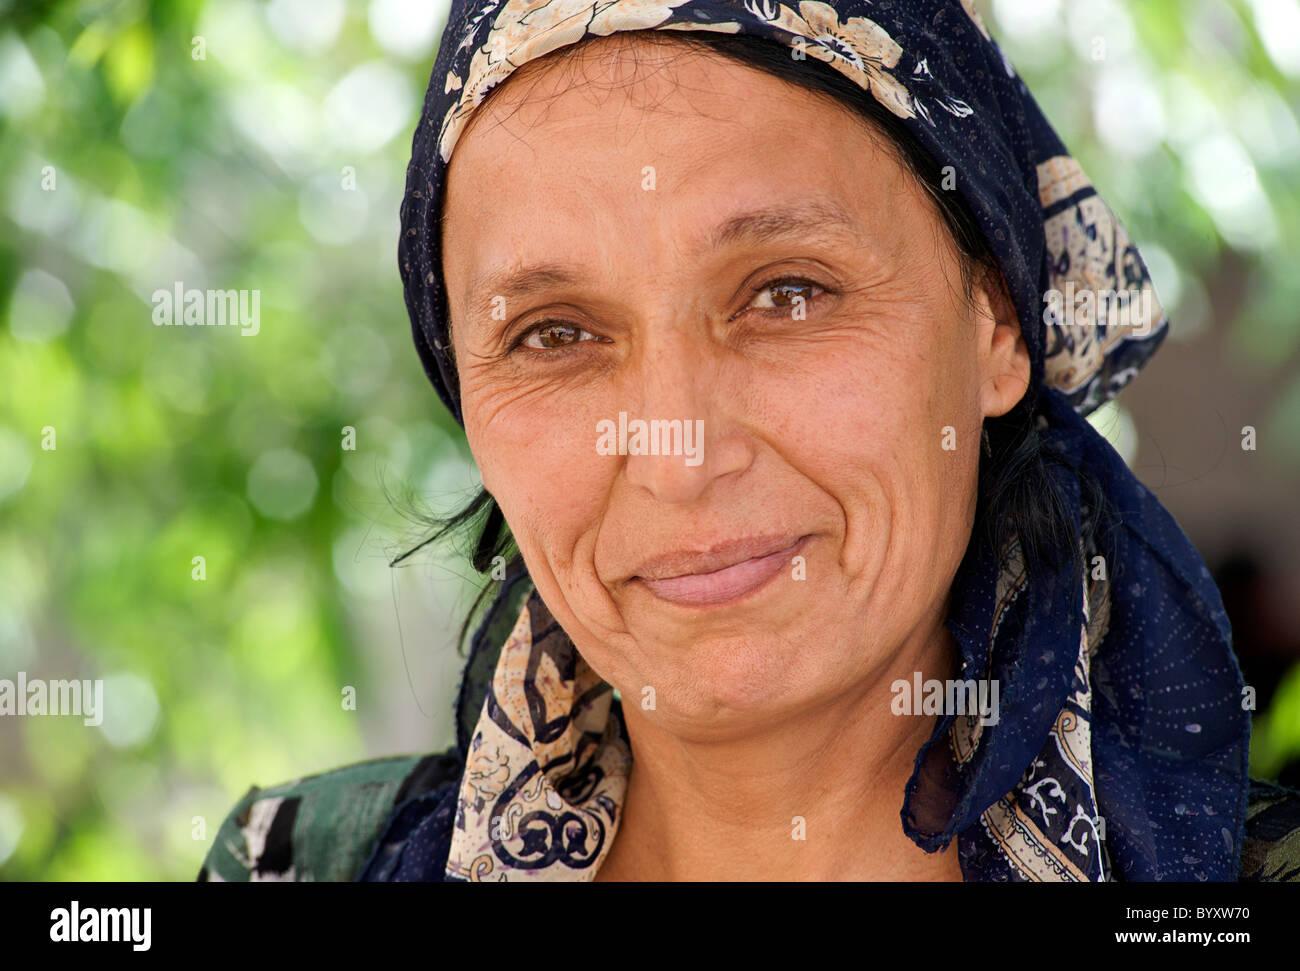 Portrait of a friendly woman selling at market, Khiva, Uzbekistan. Uzbeki style dress. RELEASED  (please enquire - Stock Image